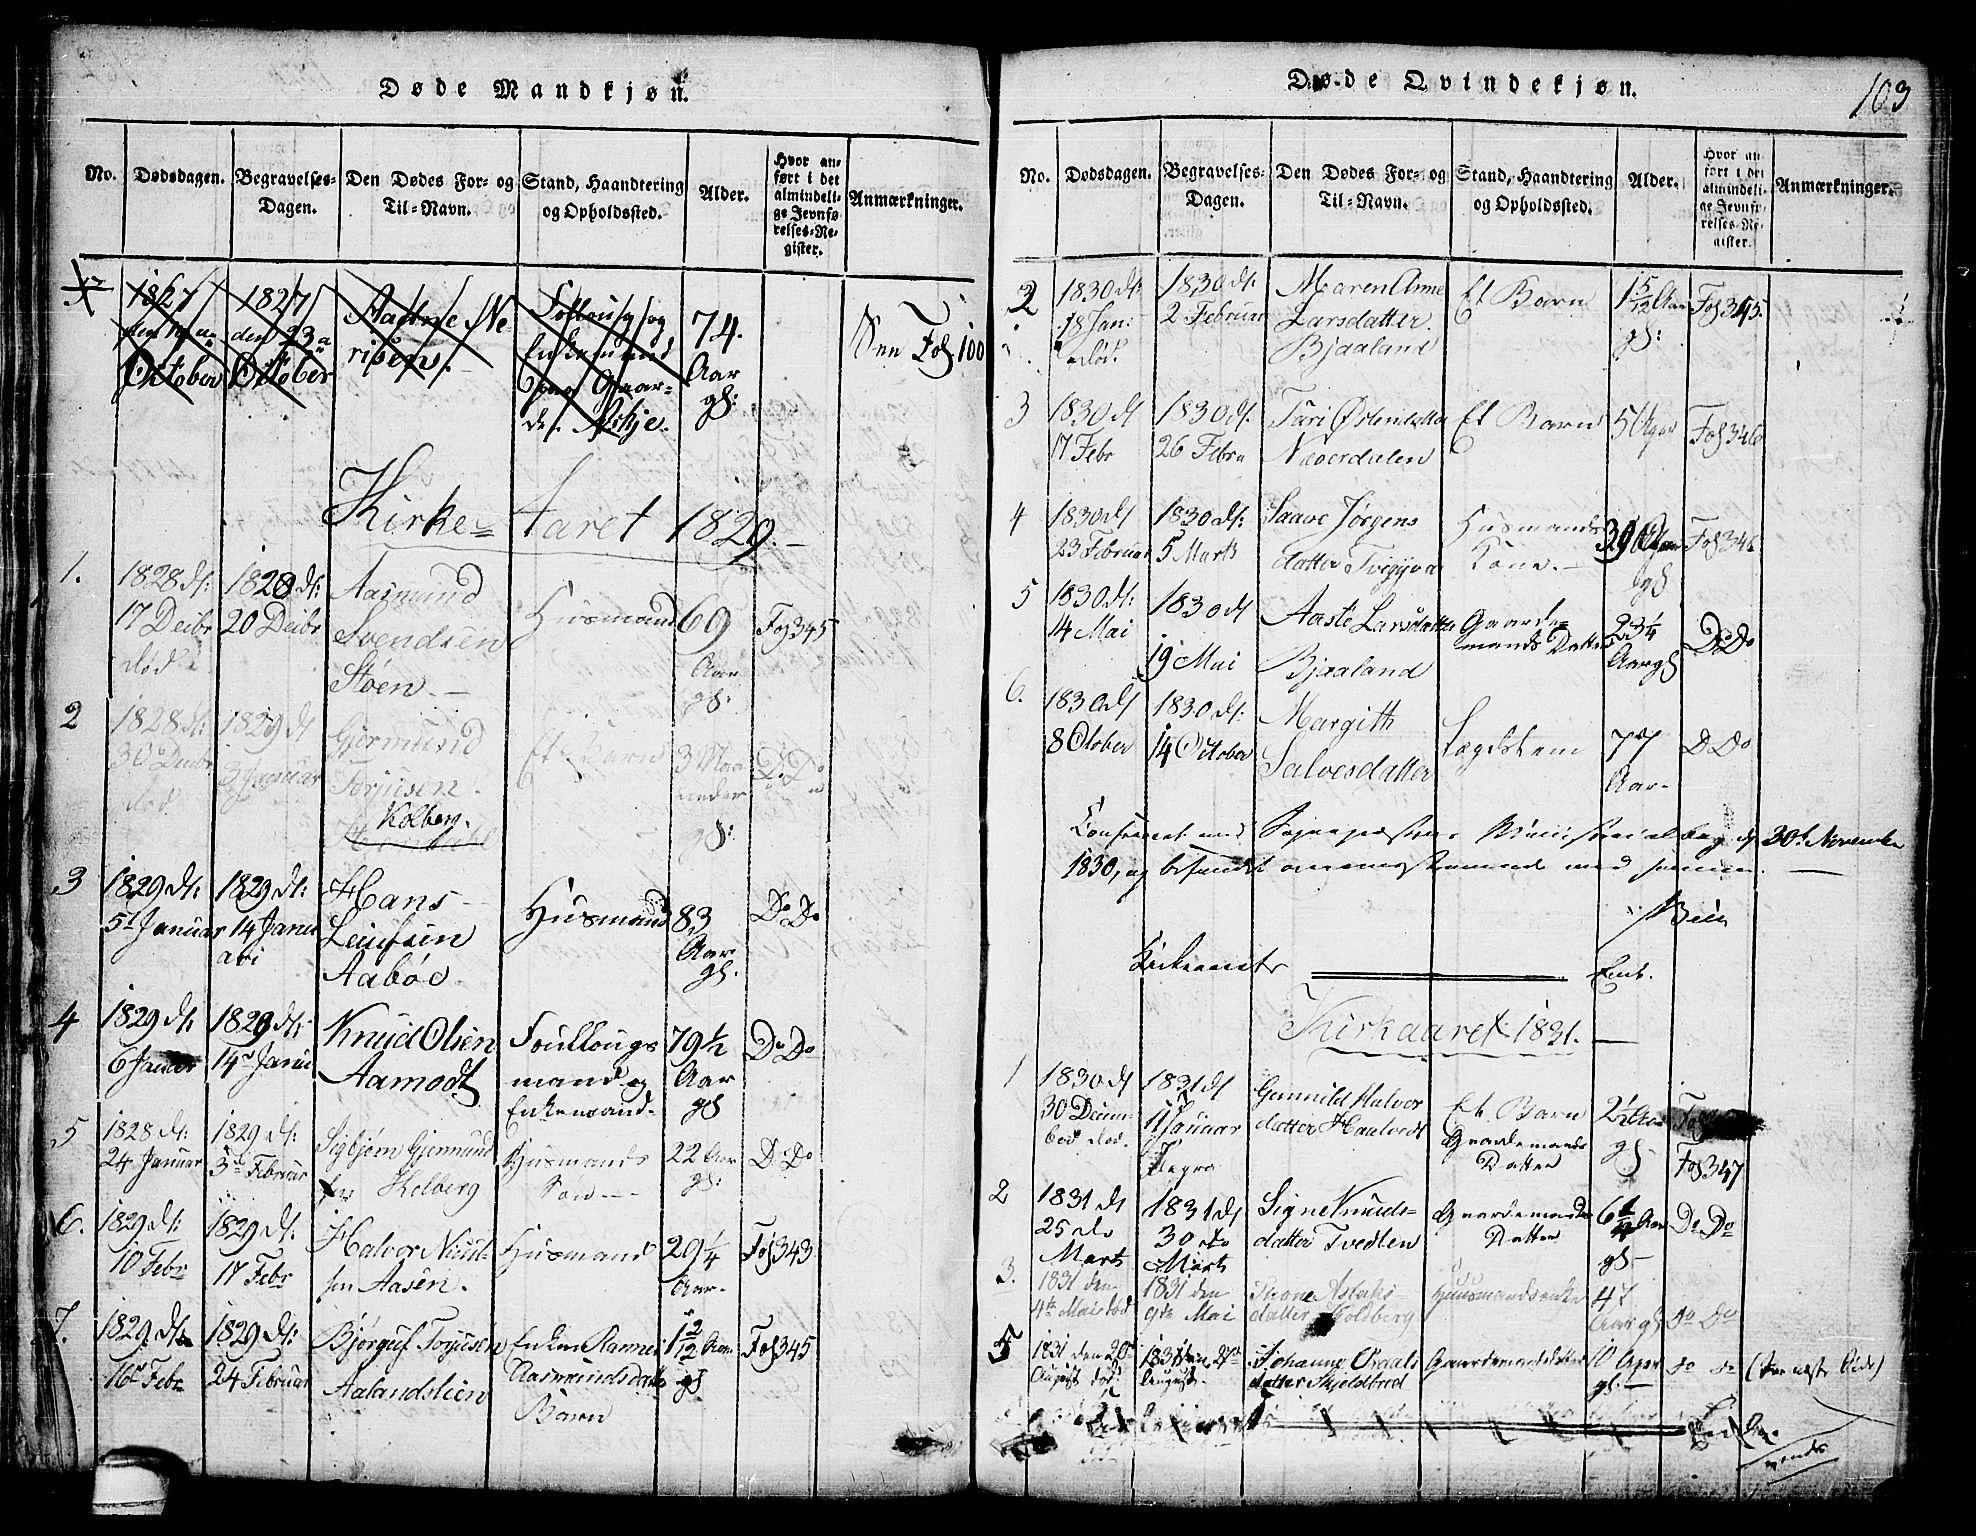 SAKO, Lårdal kirkebøker, G/Ga/L0001: Klokkerbok nr. I 1, 1815-1861, s. 103